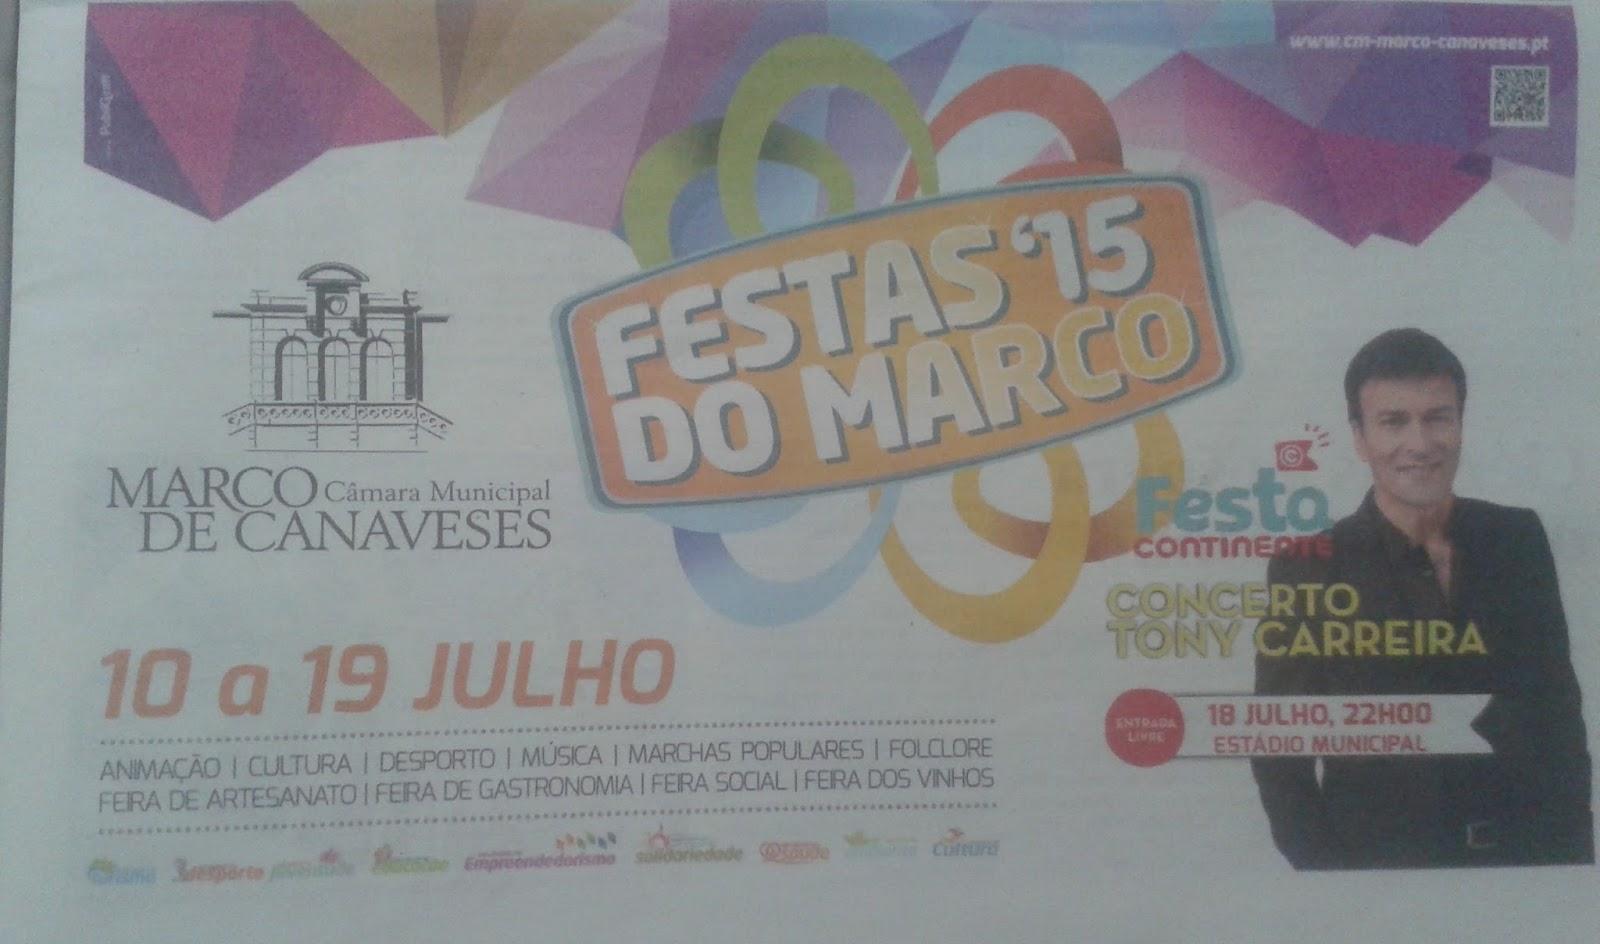 Programa das festa de Marco de Canavezes